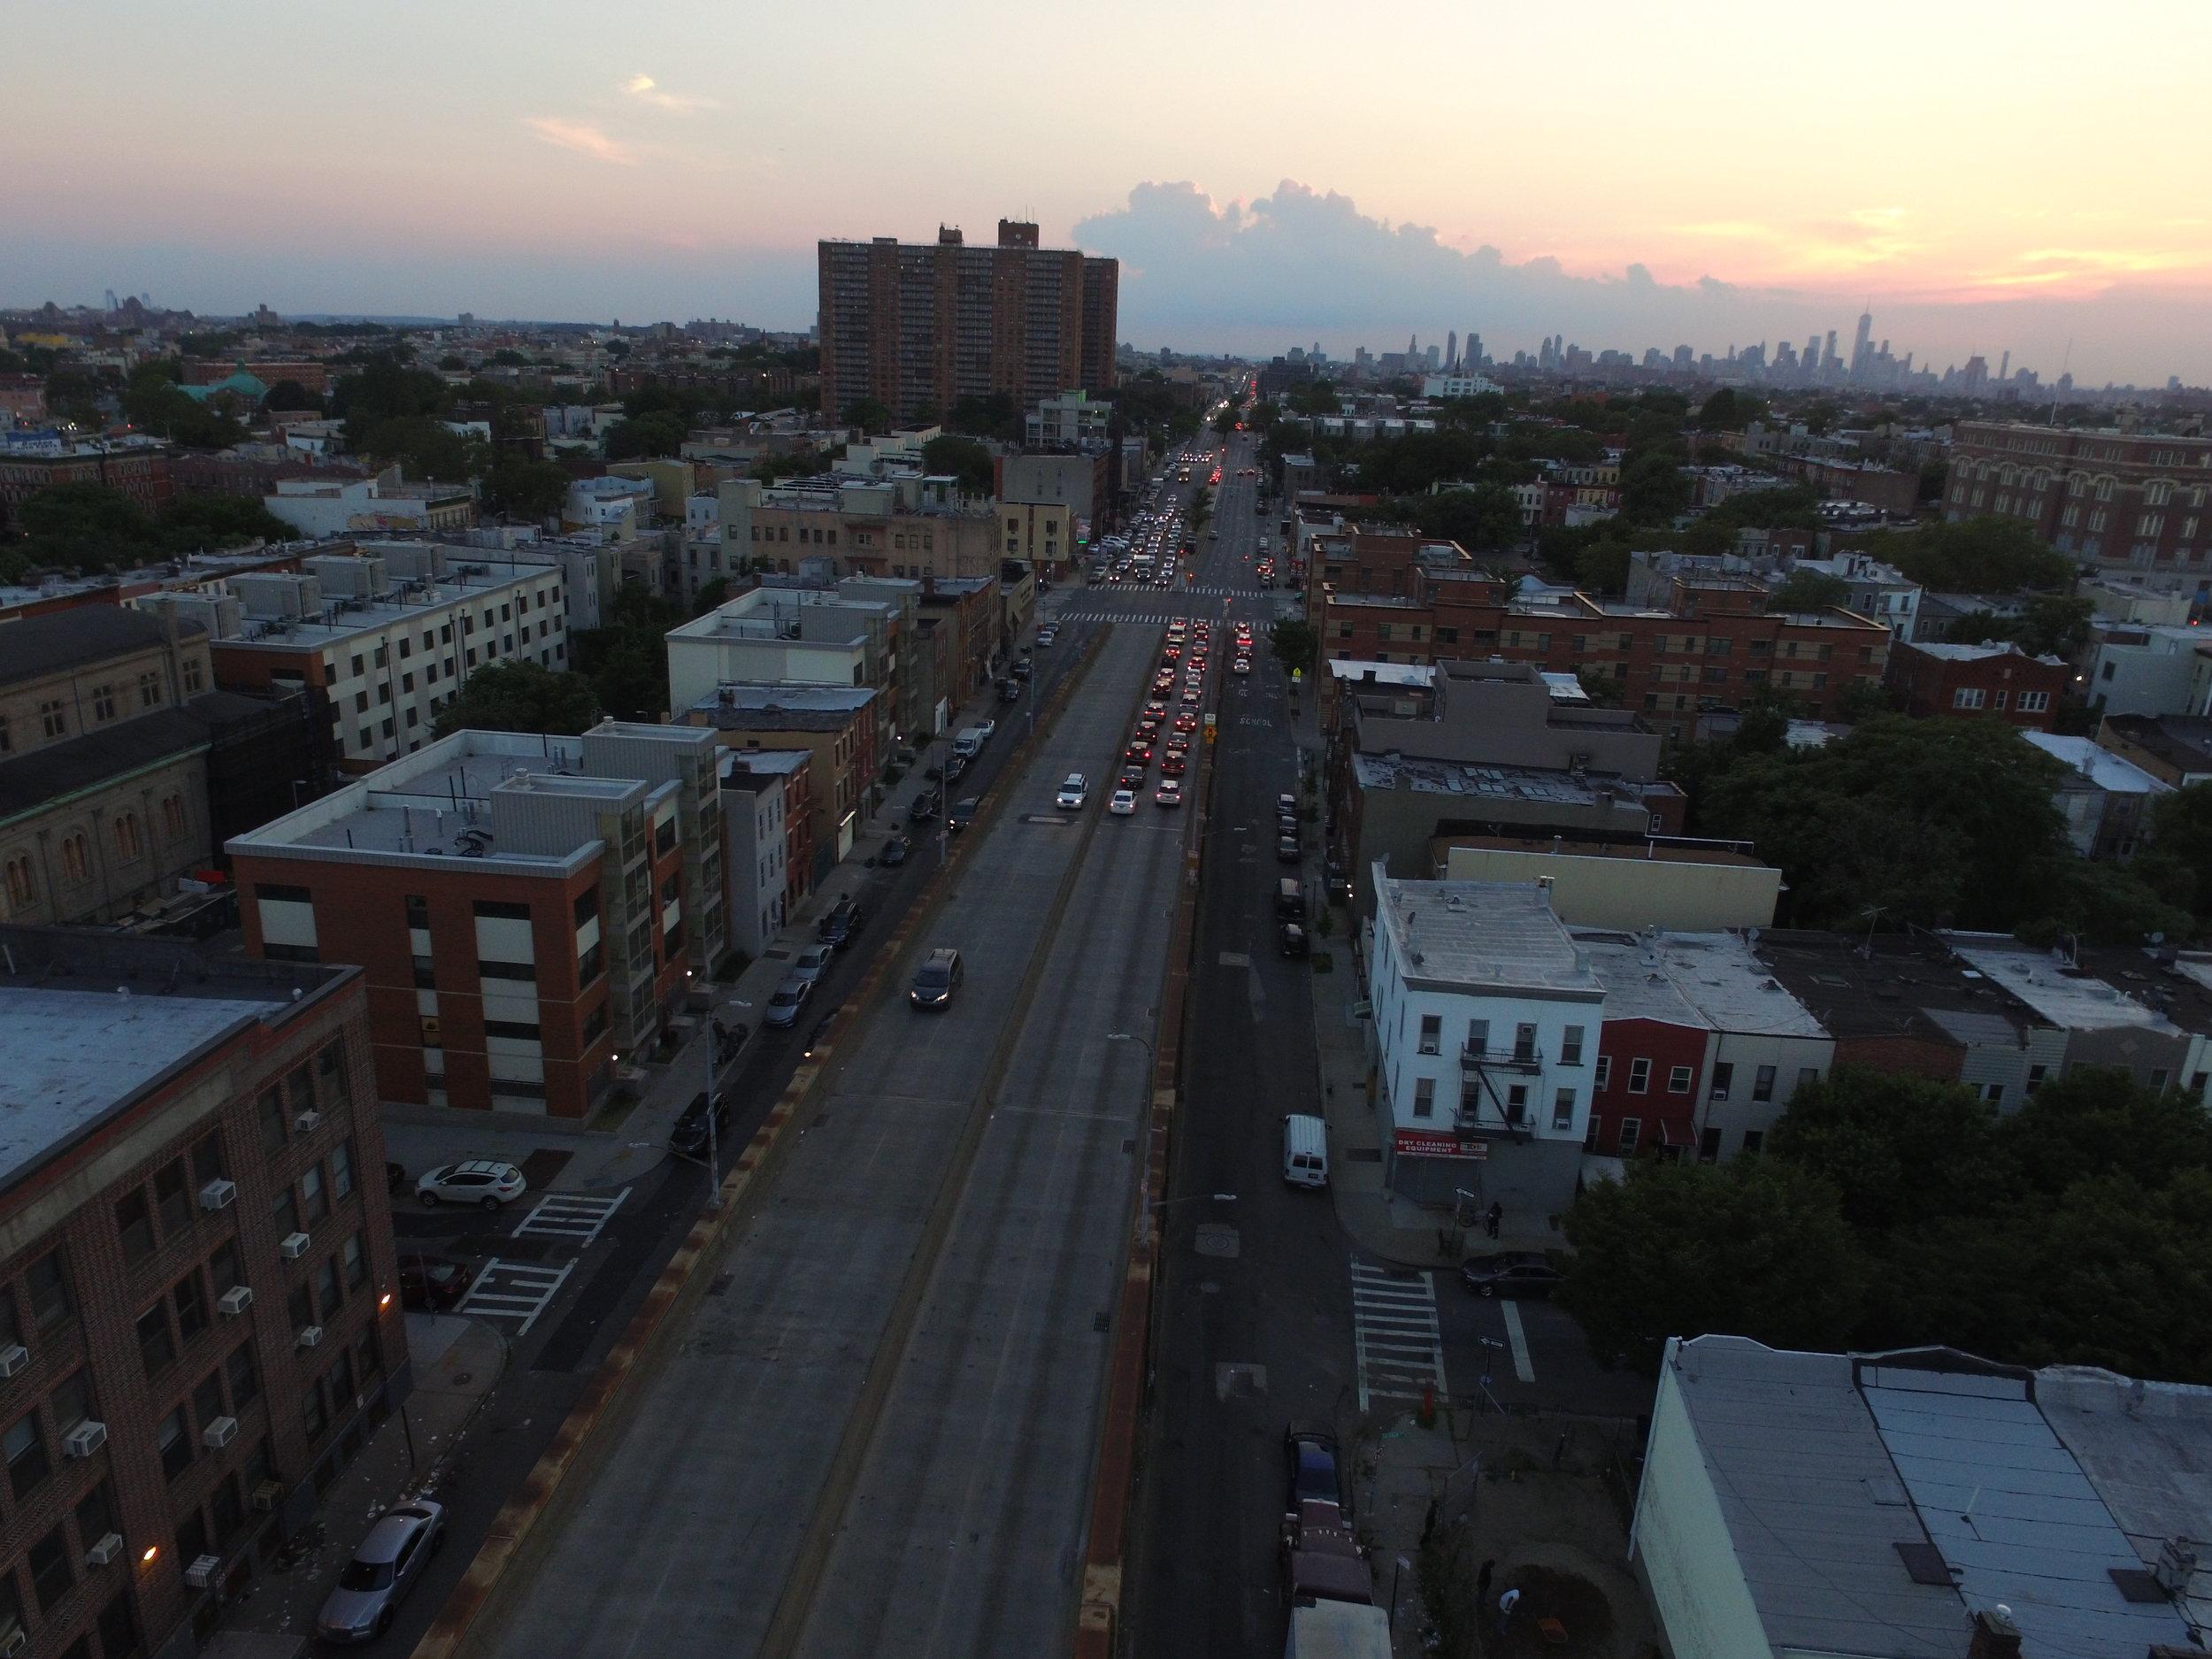 Atlantic Avenue at Sackman Street looking west.Photo: Darryl Montgomery, 2017.